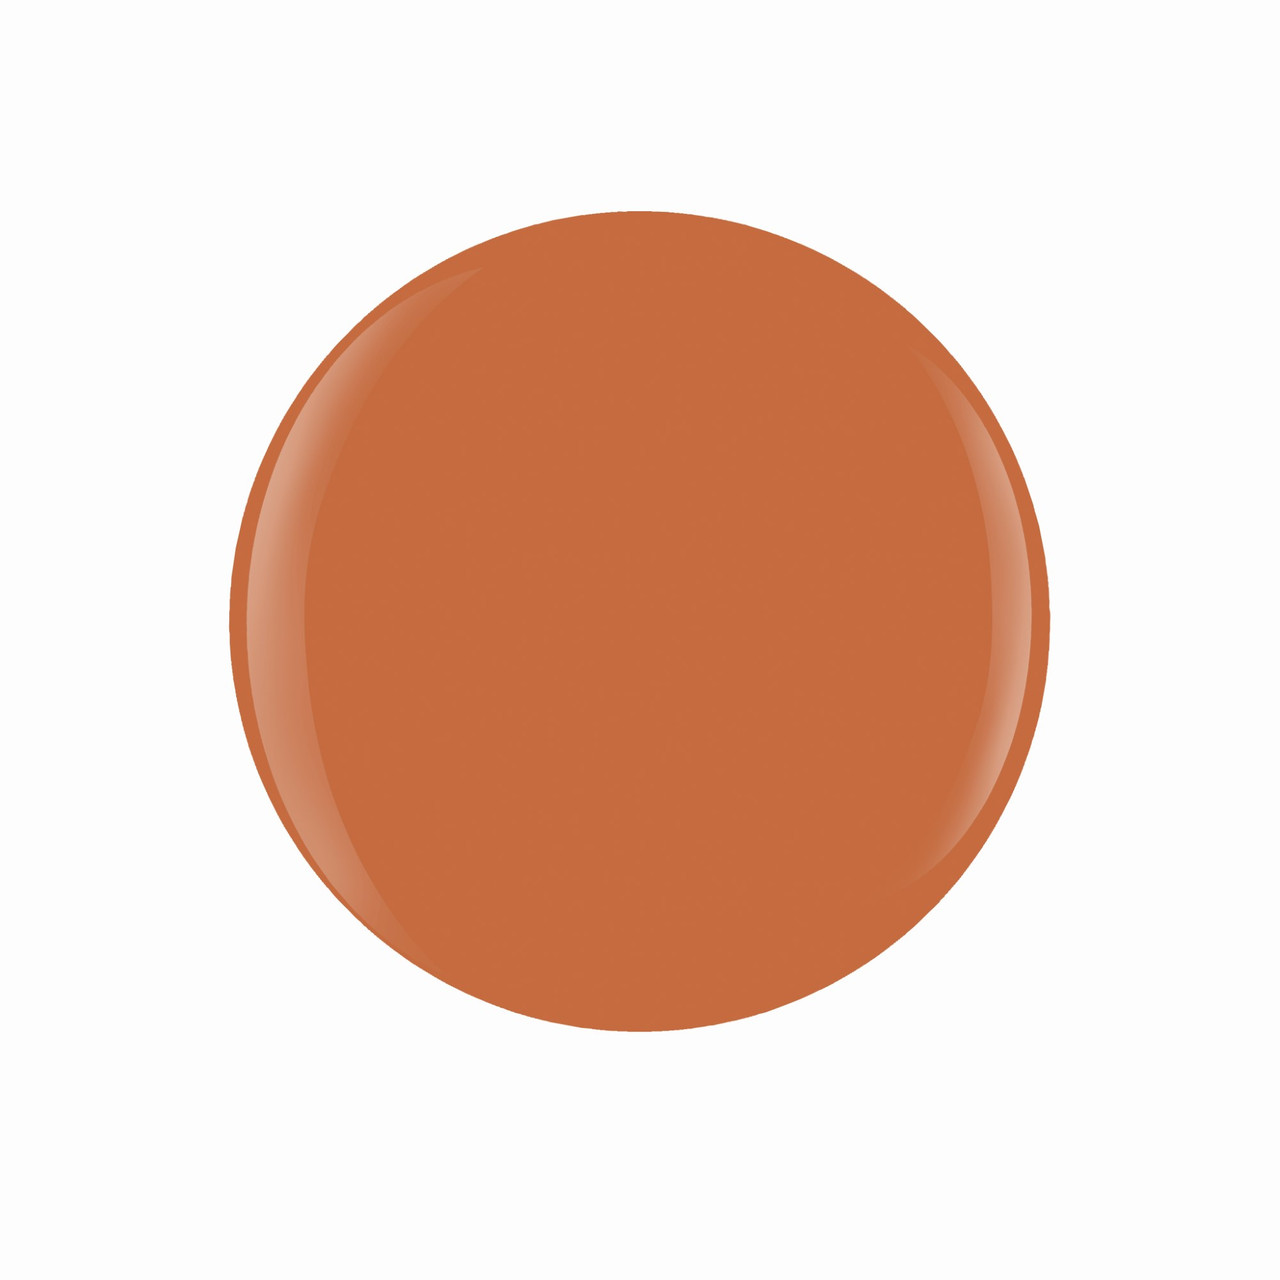 "Gelish Xpress Dip ""Catch Me If You Can"" - Pumpkin Crème - 43g   1.5 oz."